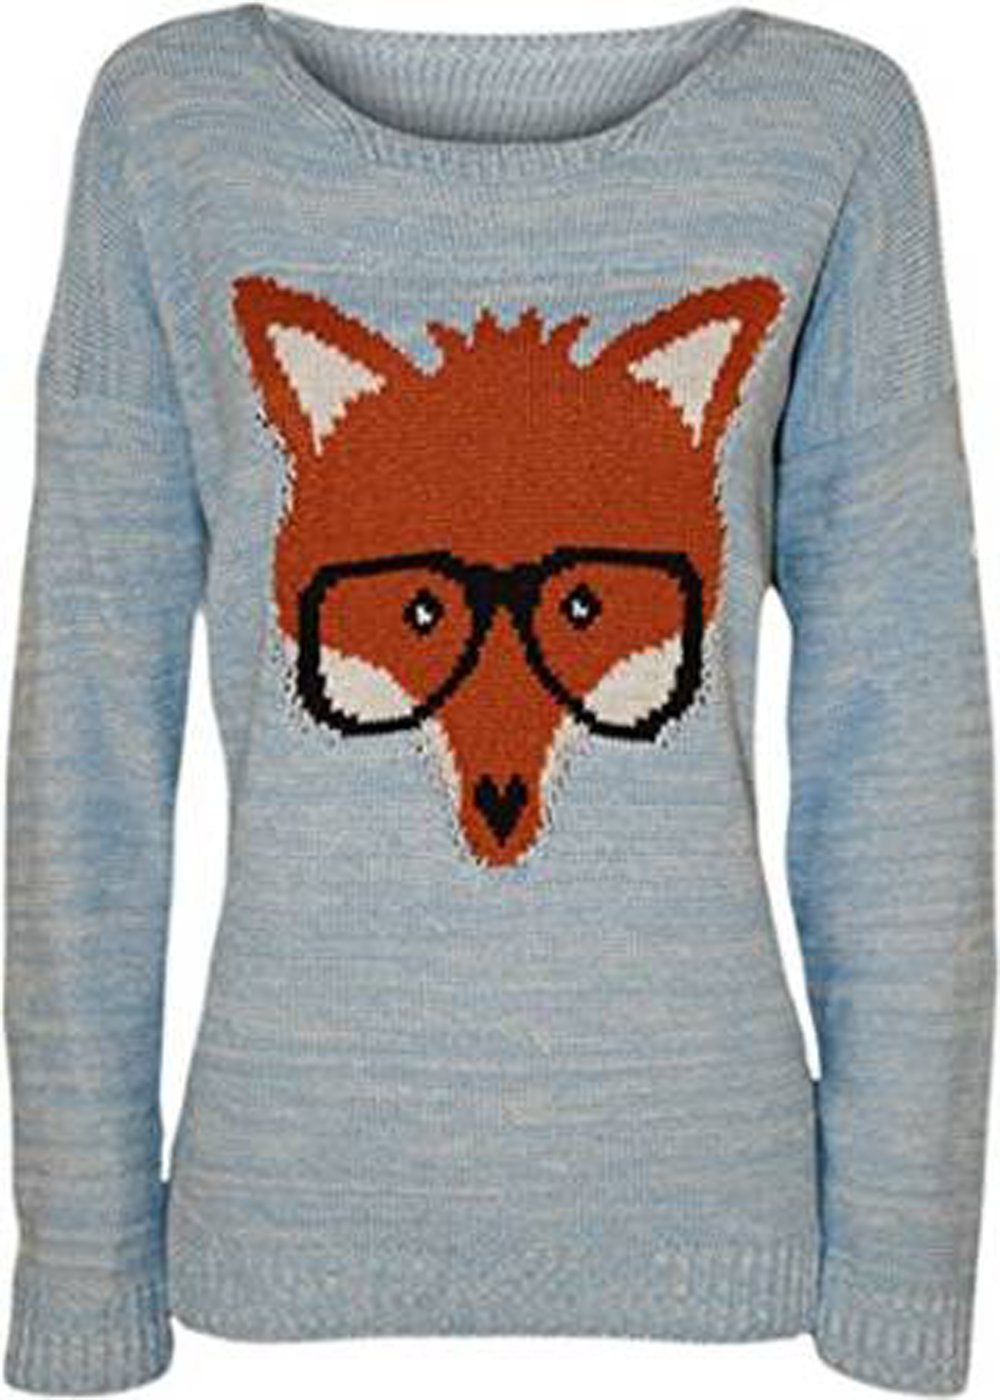 Classy Trendz Womens Fox Glasses Print Long Sleeve Knitted Stretch Jumper (Blue, SM)